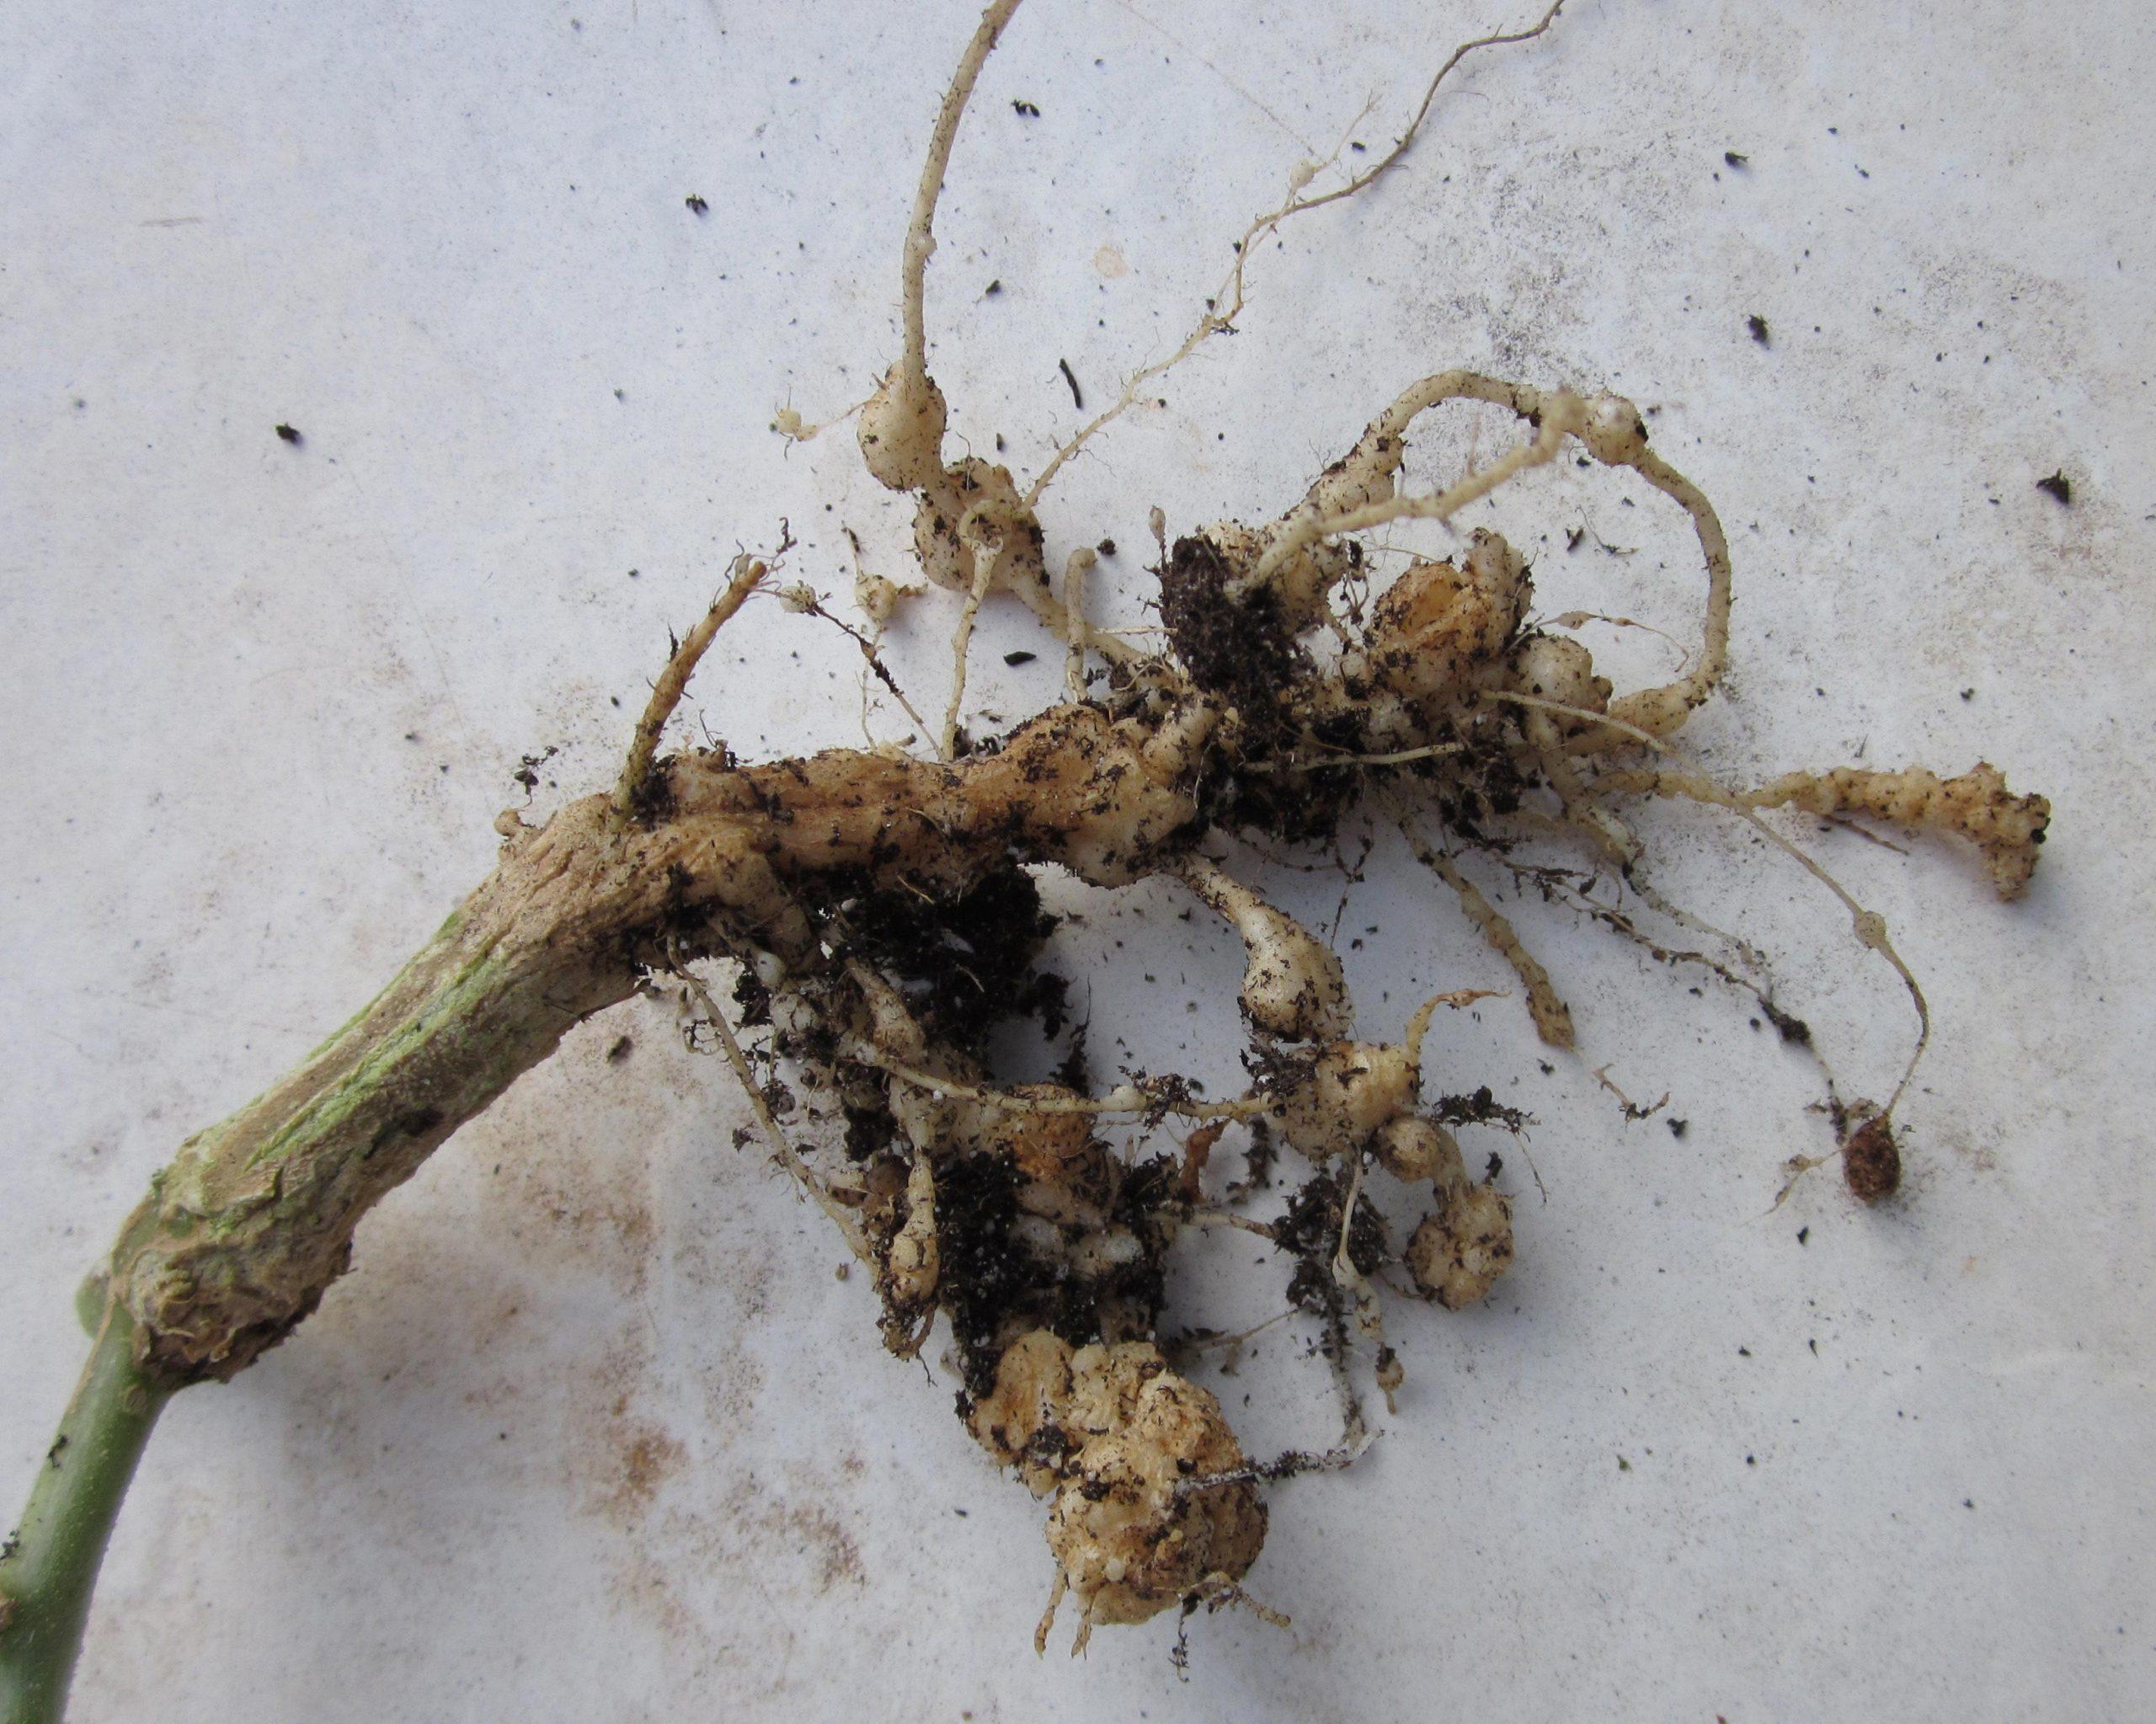 root knot nematode damage